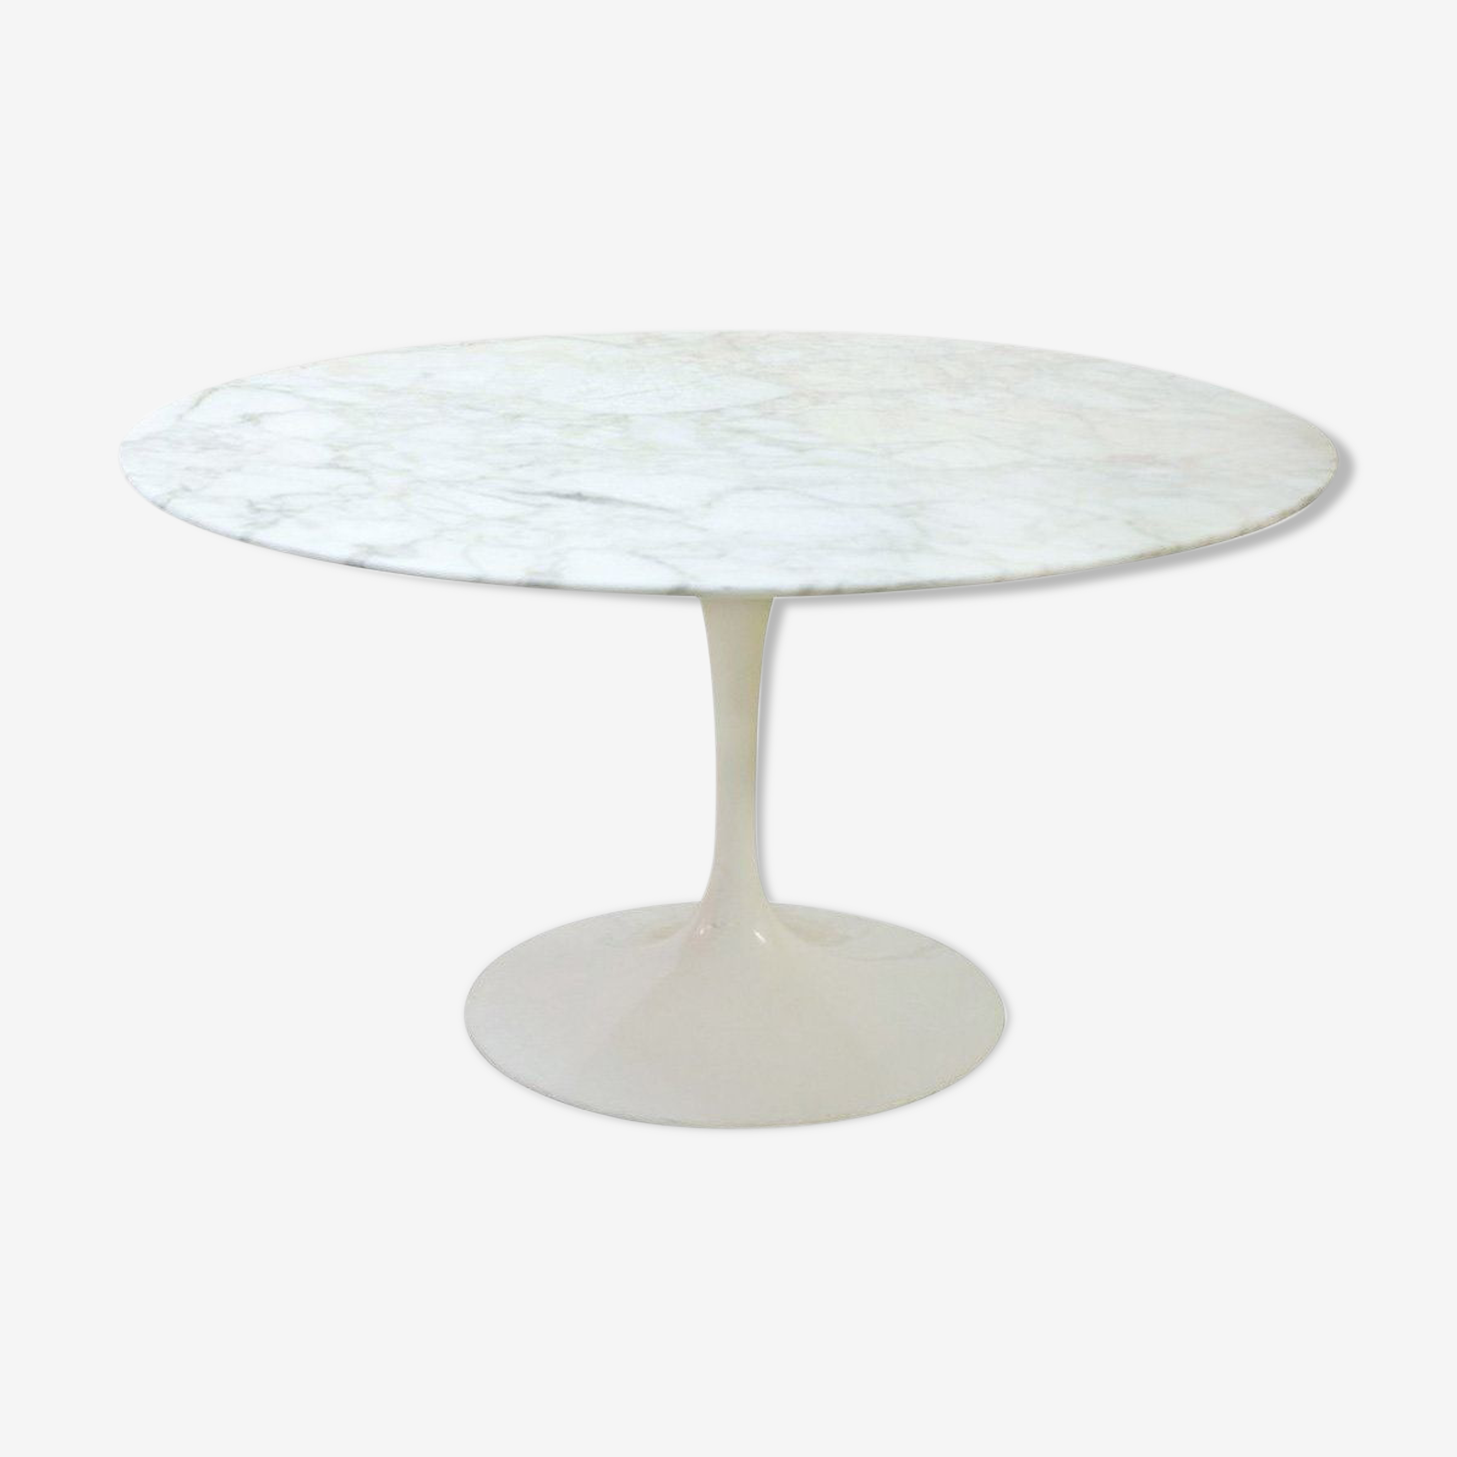 Table 137 cm Tulip Vintage by Eero Saarinen for Knoll Calacatta marble